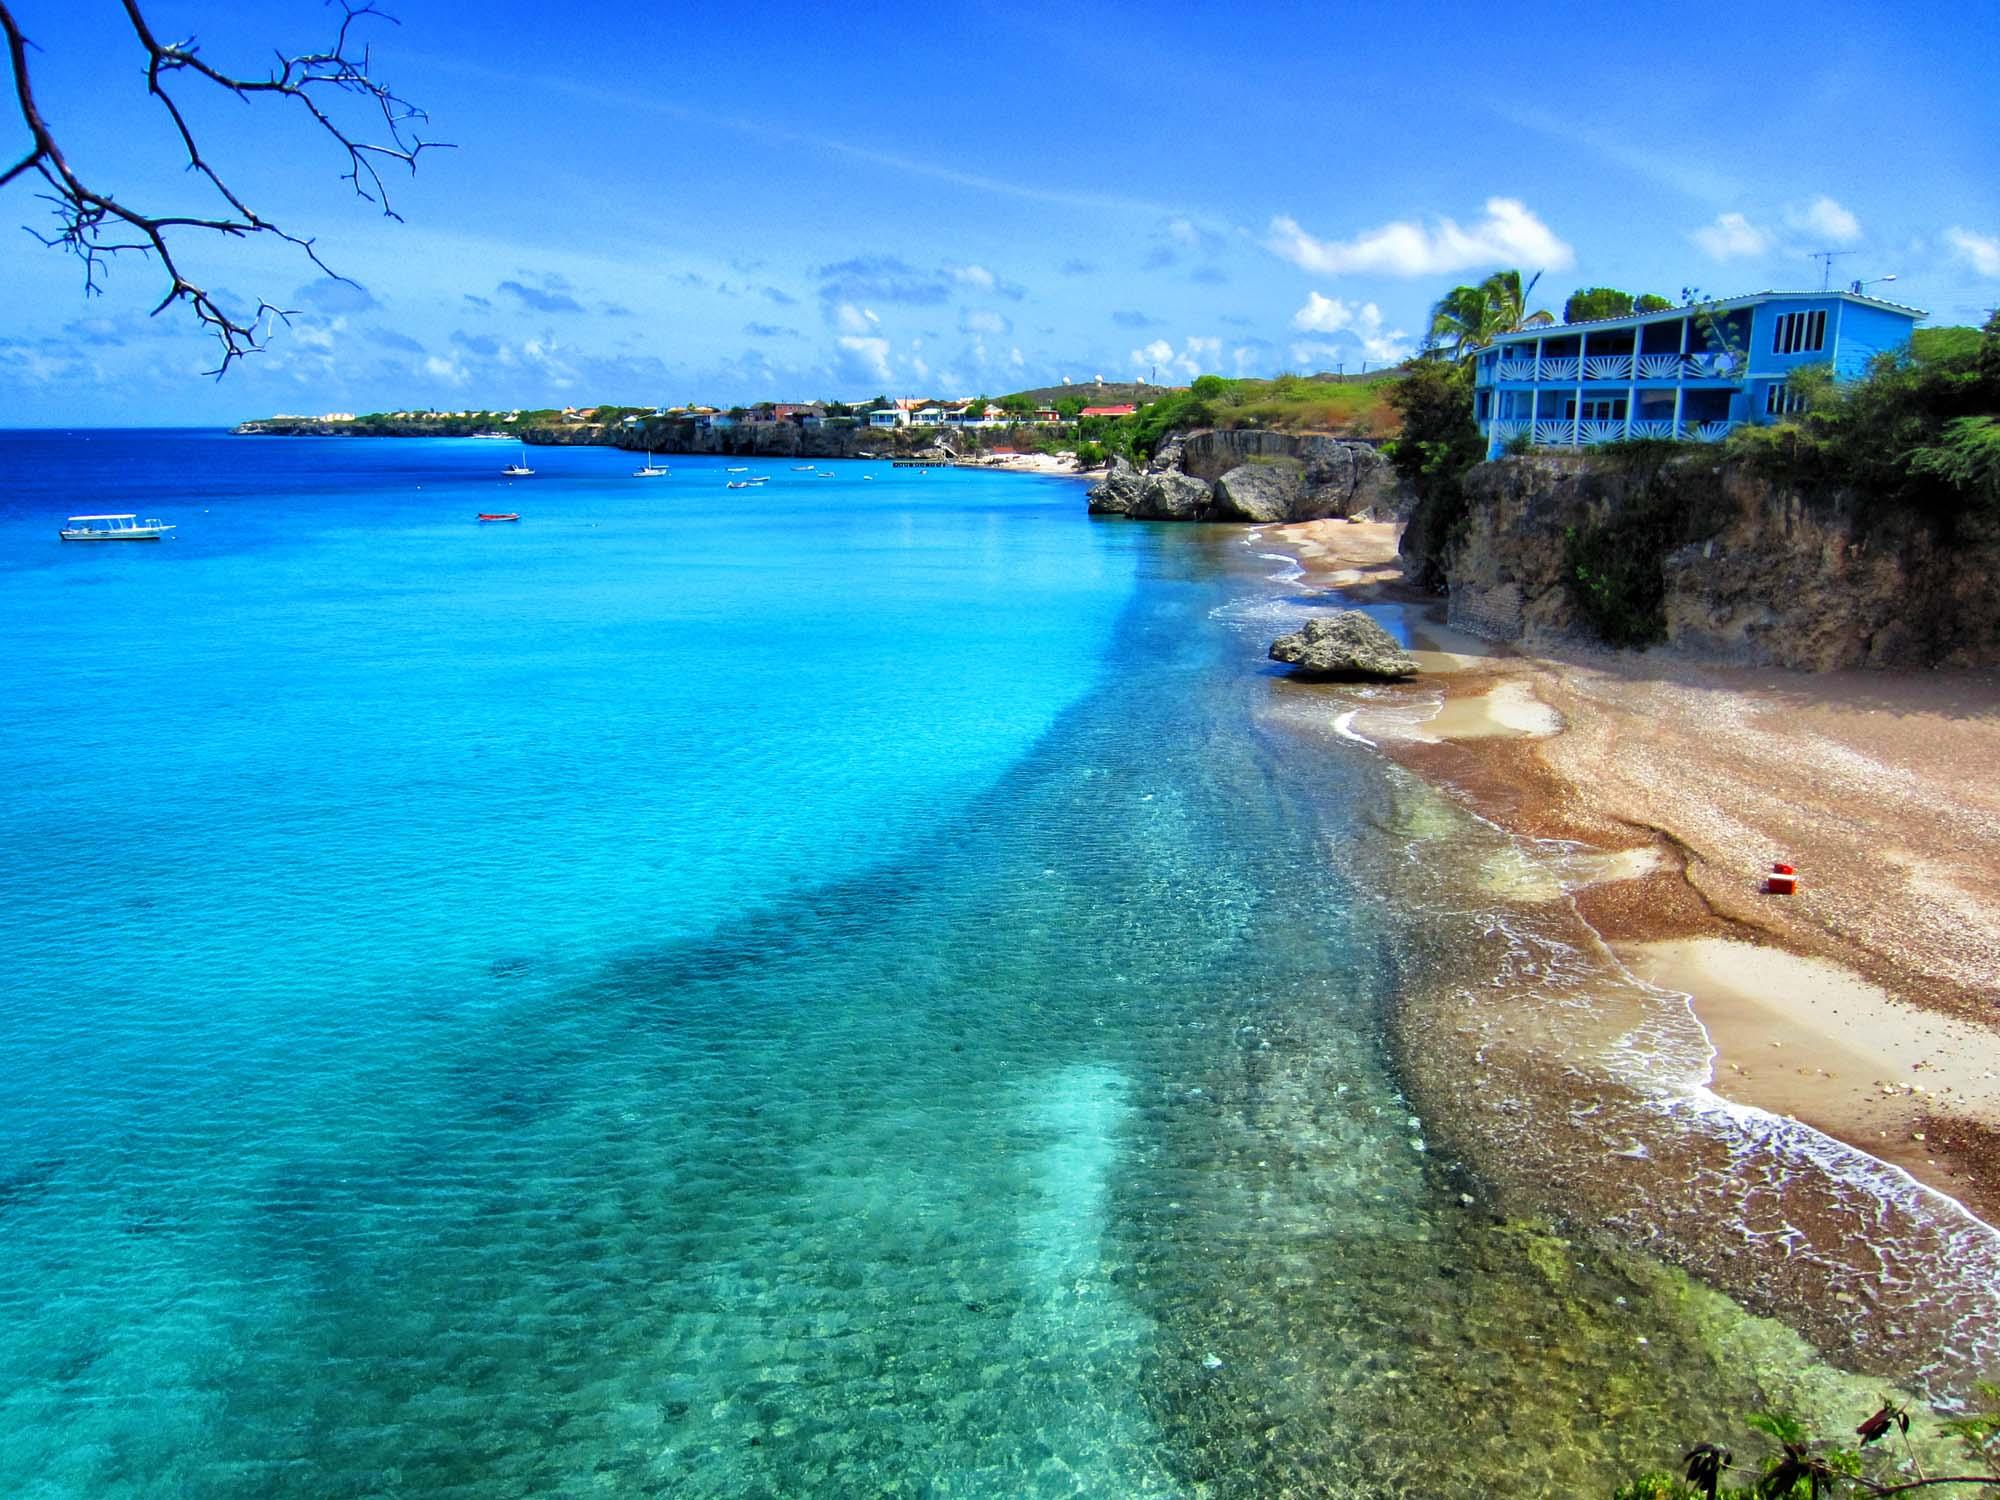 mooiste stranden van Curaçao playa forti